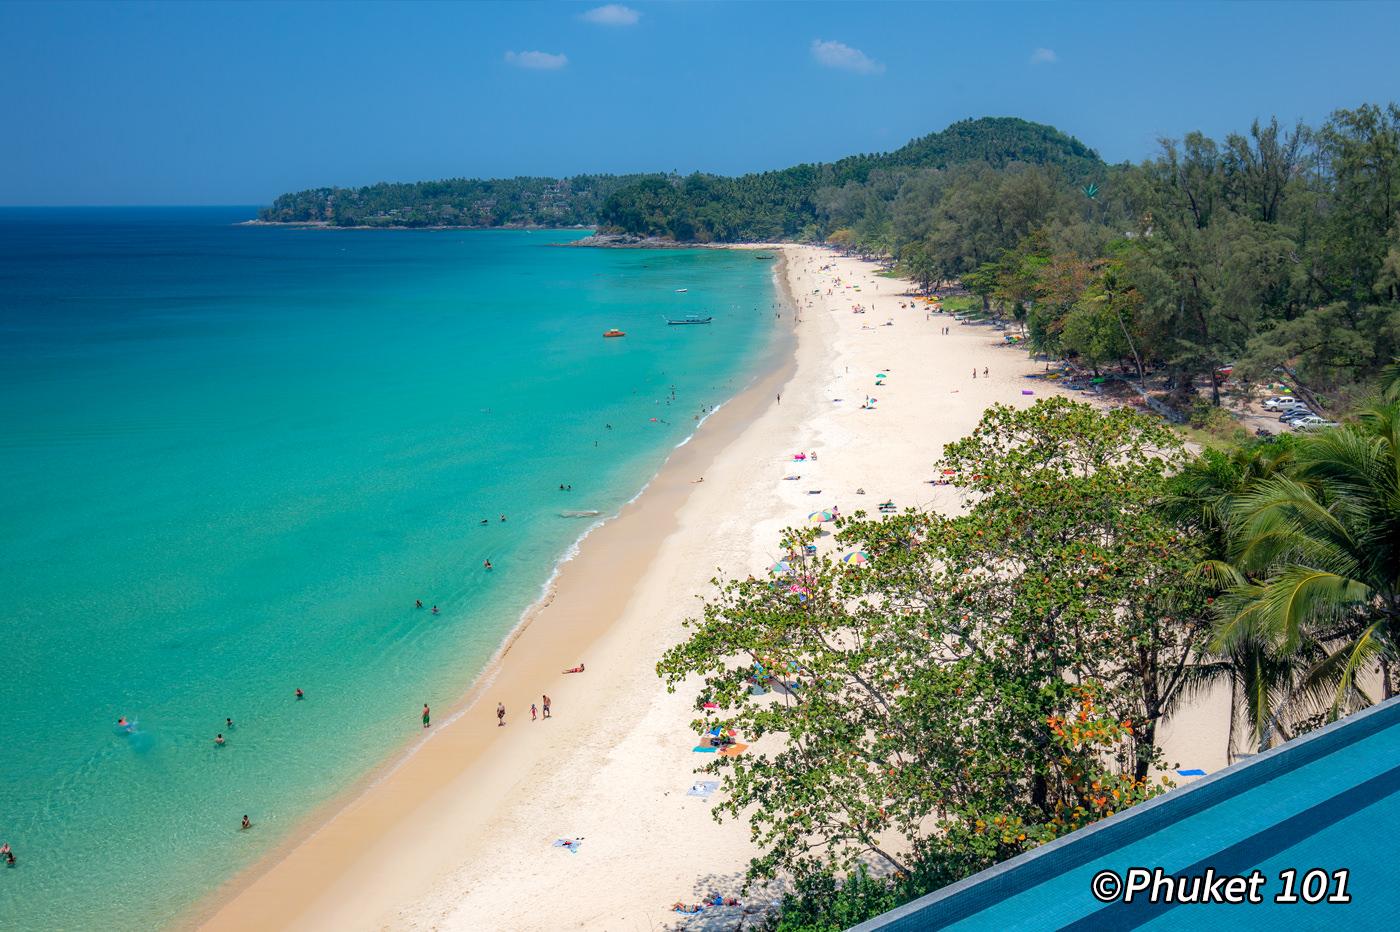 Surin Beach - What to Do on Surin Beach